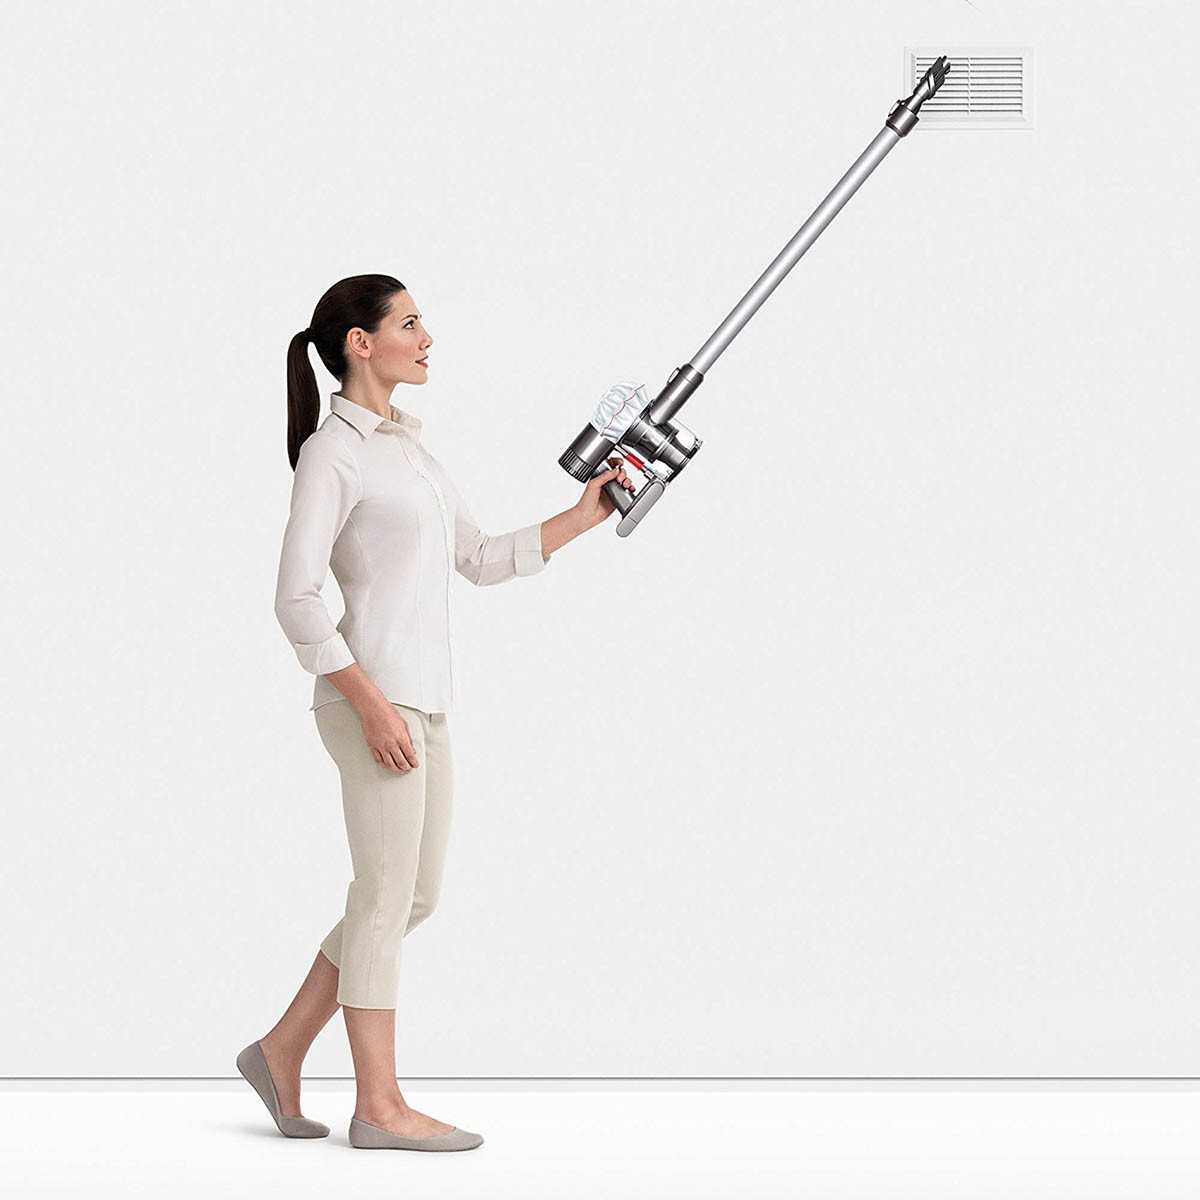 Image of: Handheld Vacuum Sylvane Dyson V6 Cordless Stick Vacuum Cleaner Sylvanecom